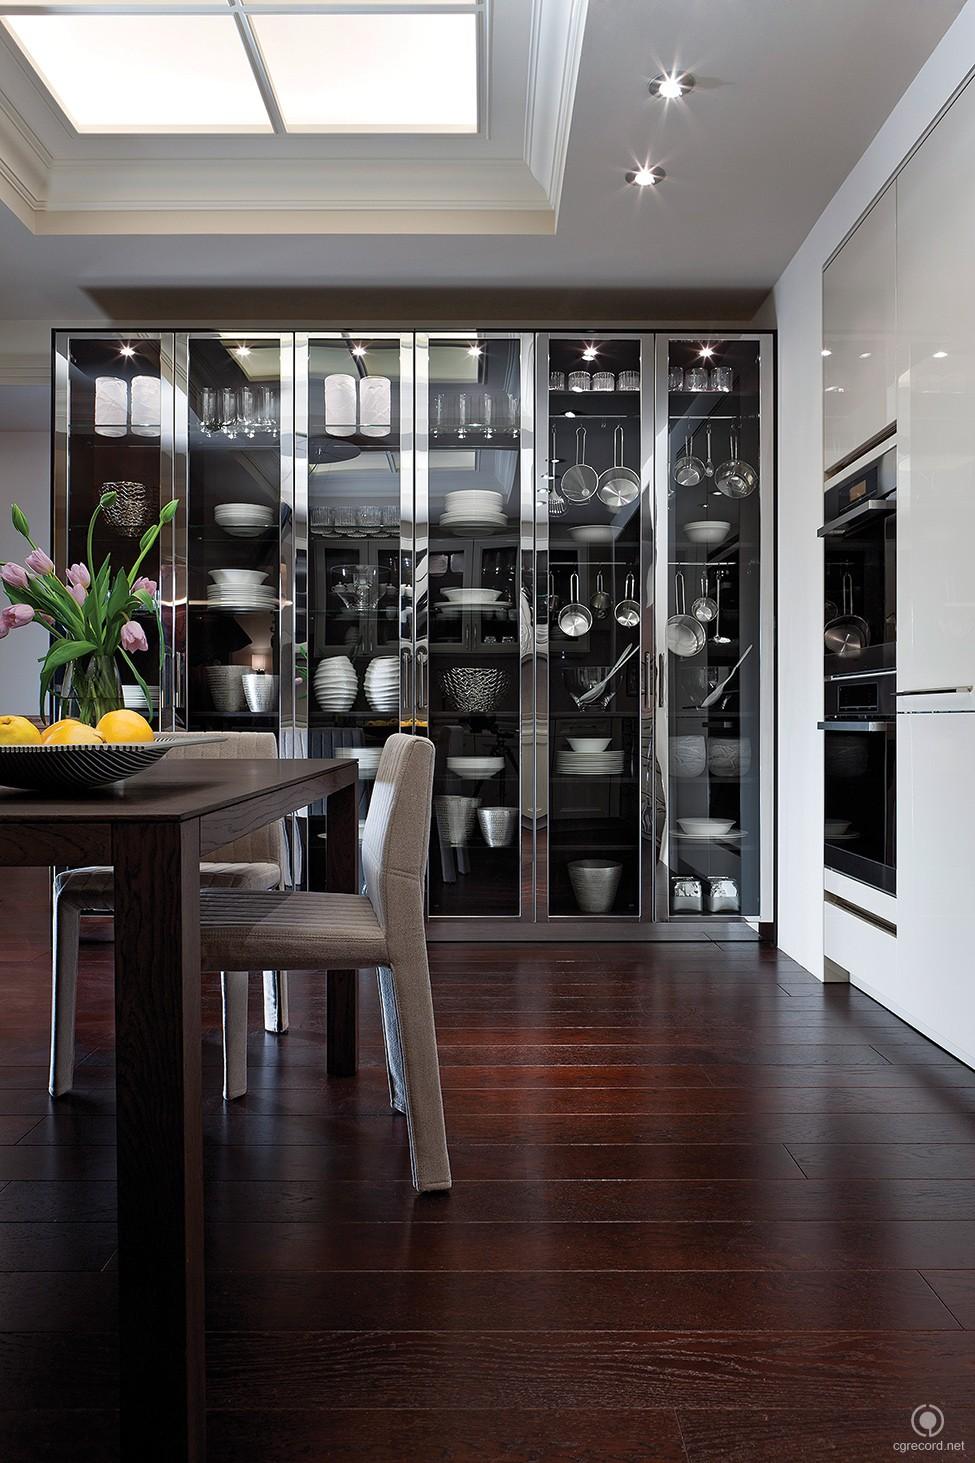 siematic kitchens inspirations area. Black Bedroom Furniture Sets. Home Design Ideas